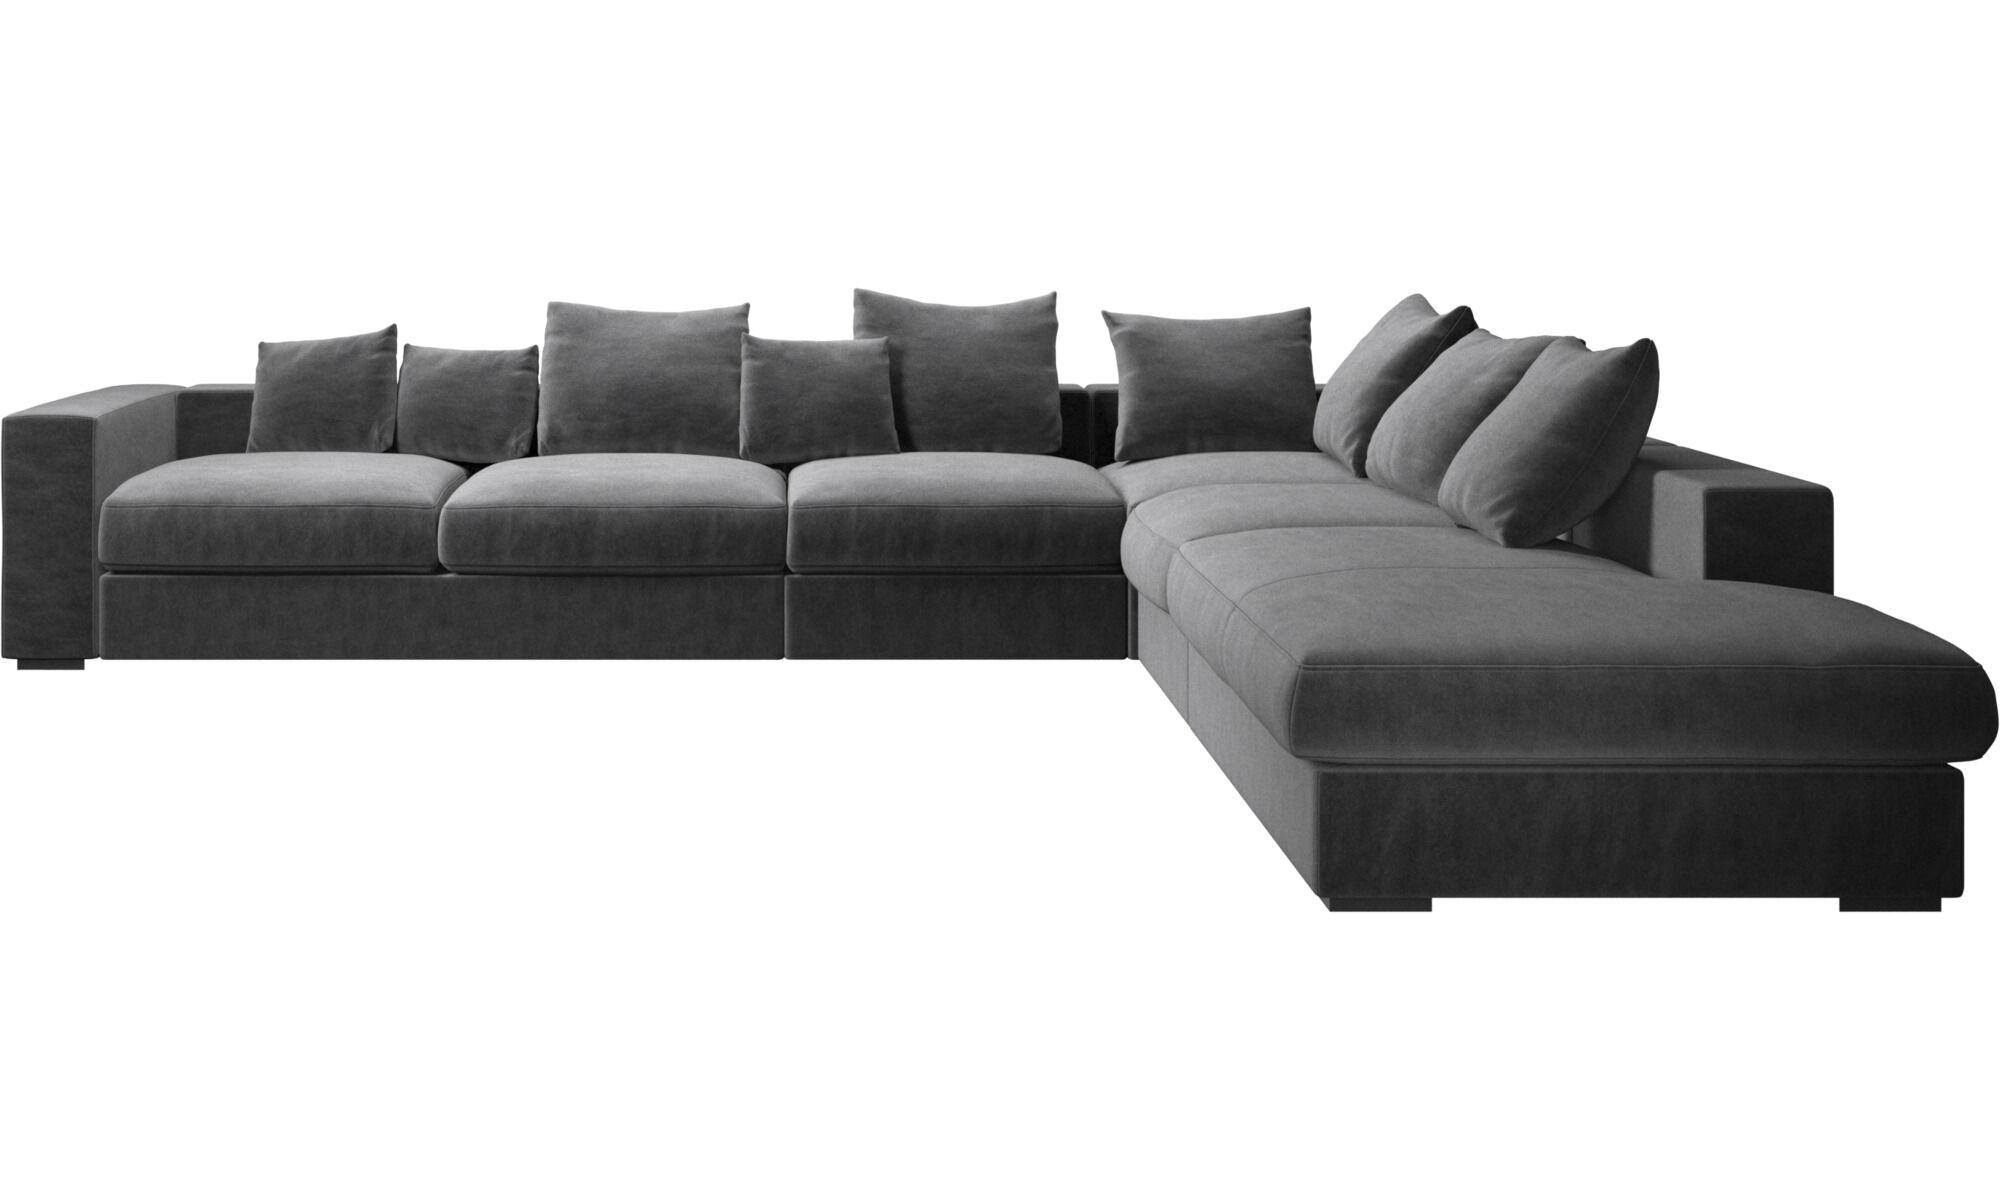 Lounge Sofas   Cenova Ecksofa Mit Loungemodul   Grau   Stoff